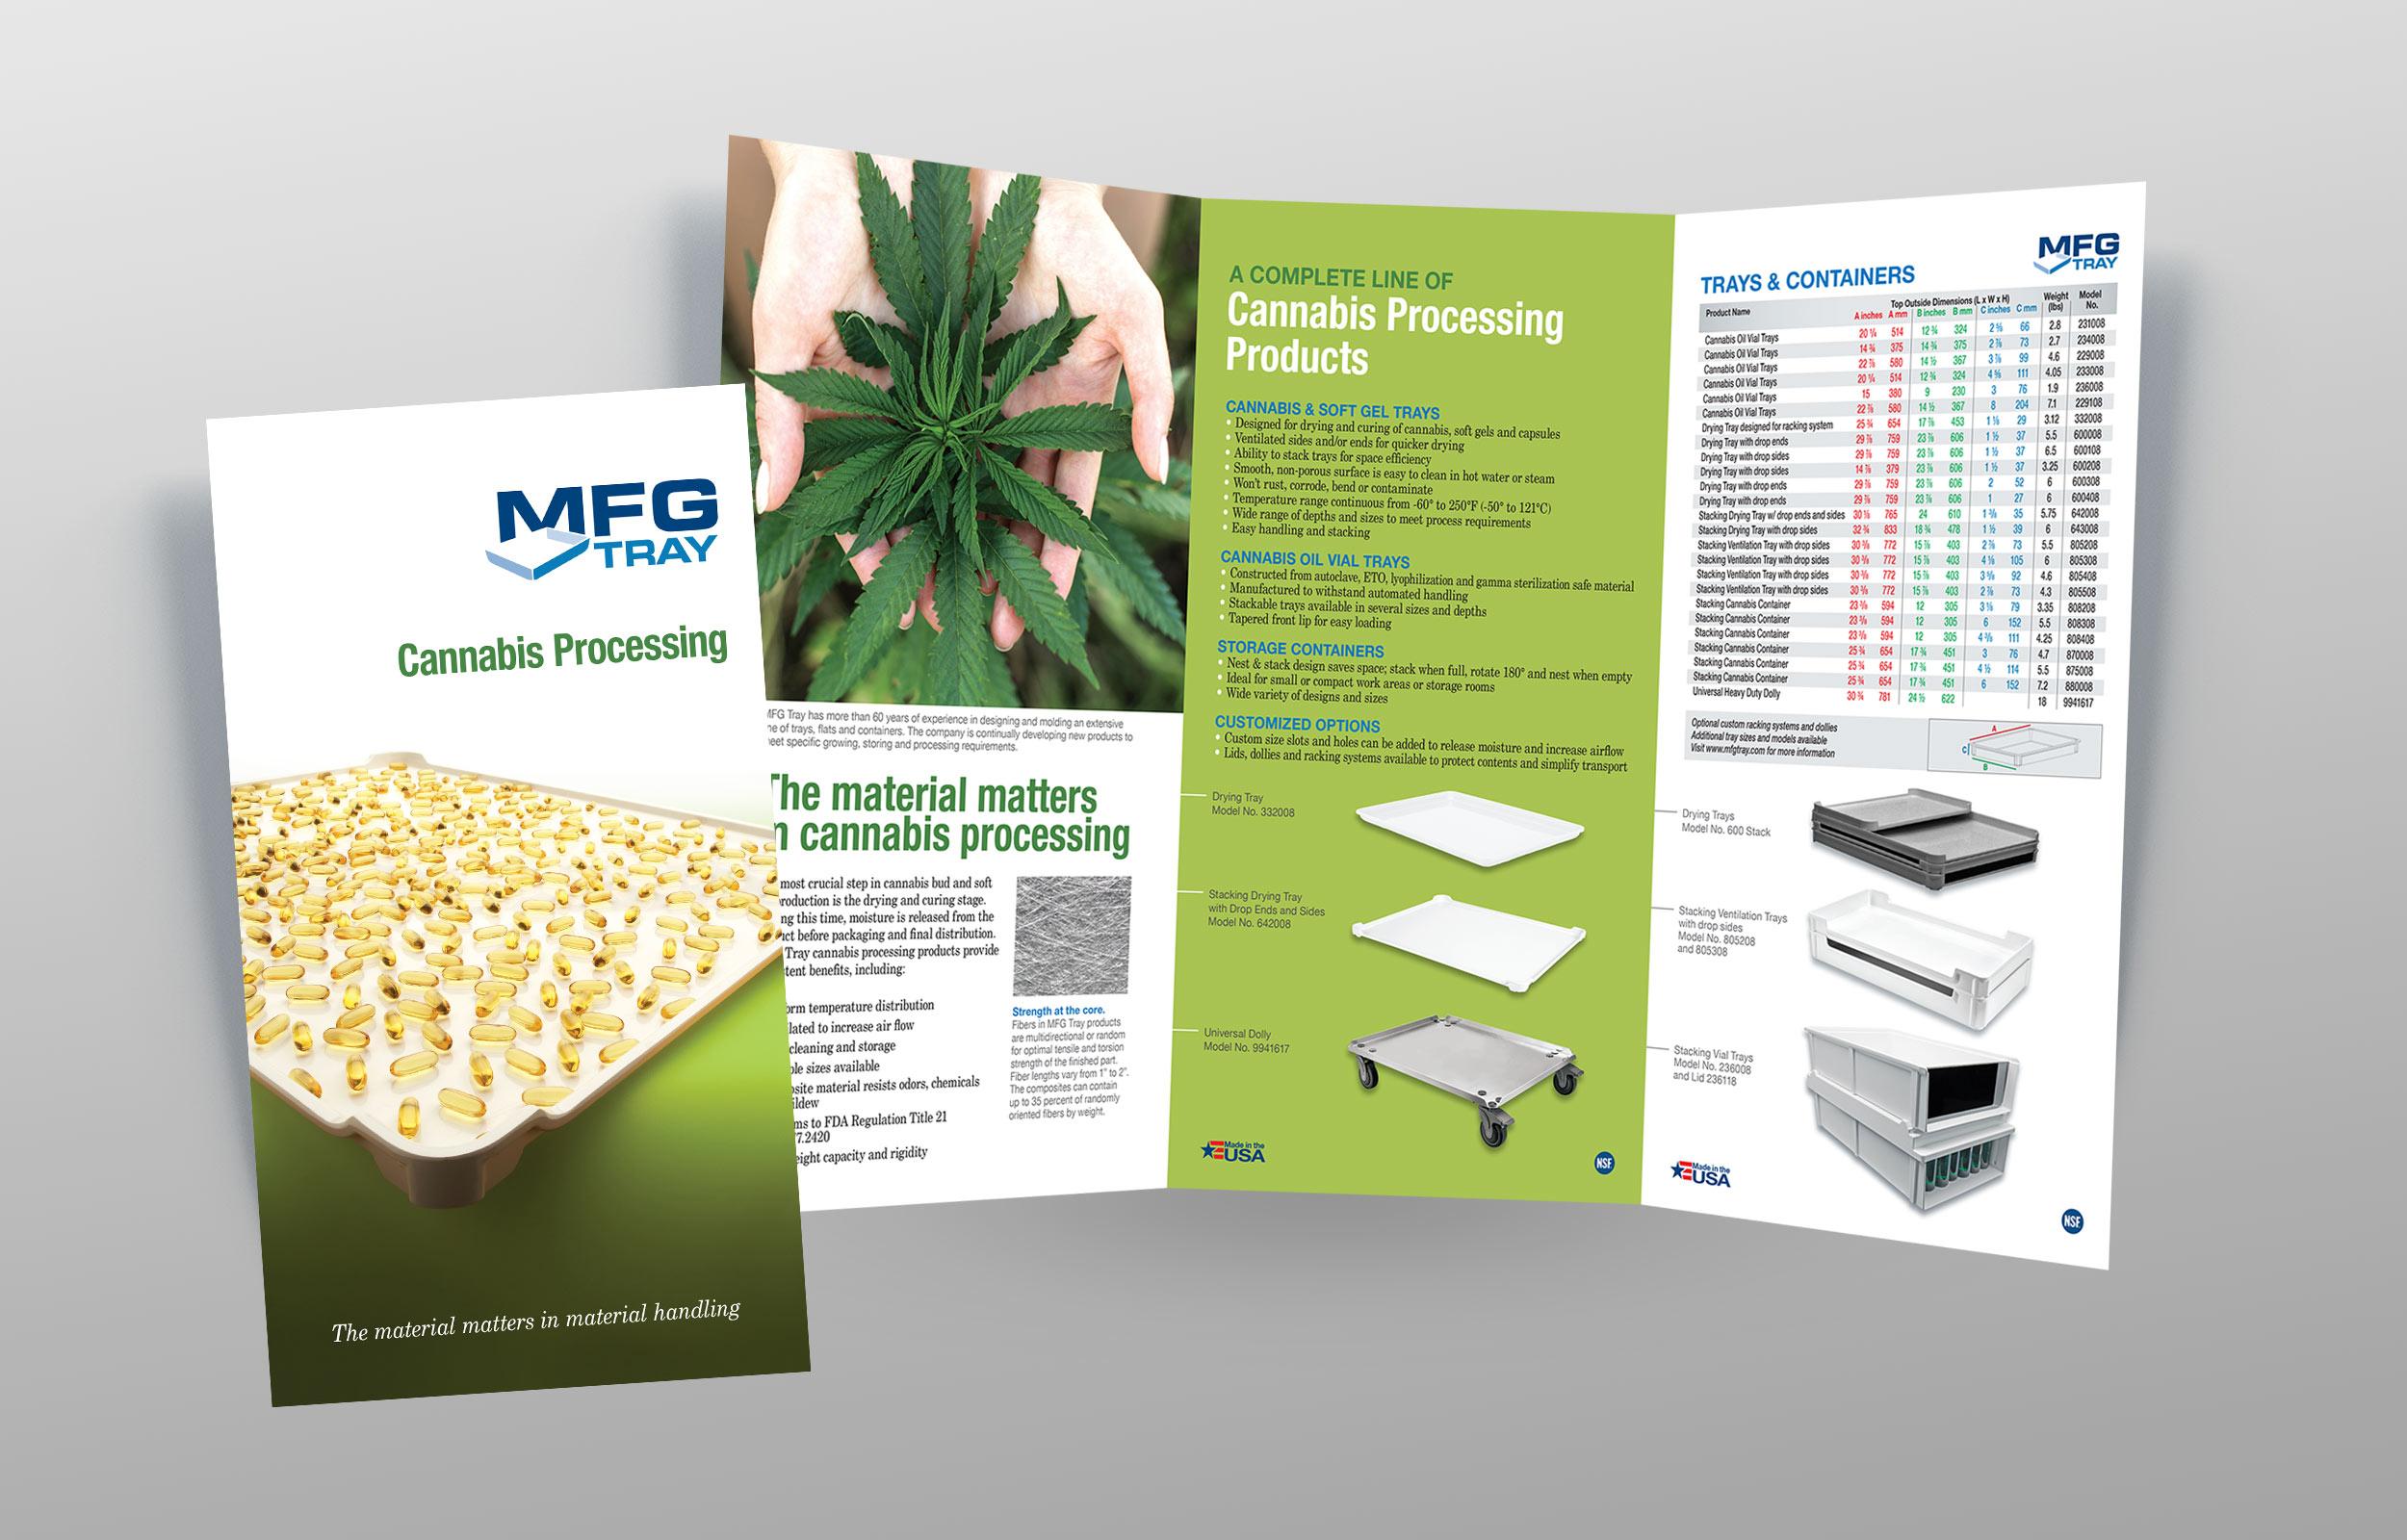 https://papaadvertising.com/wp-content/uploads/2019/08/MFTG_Canabis-Brochure.jpg